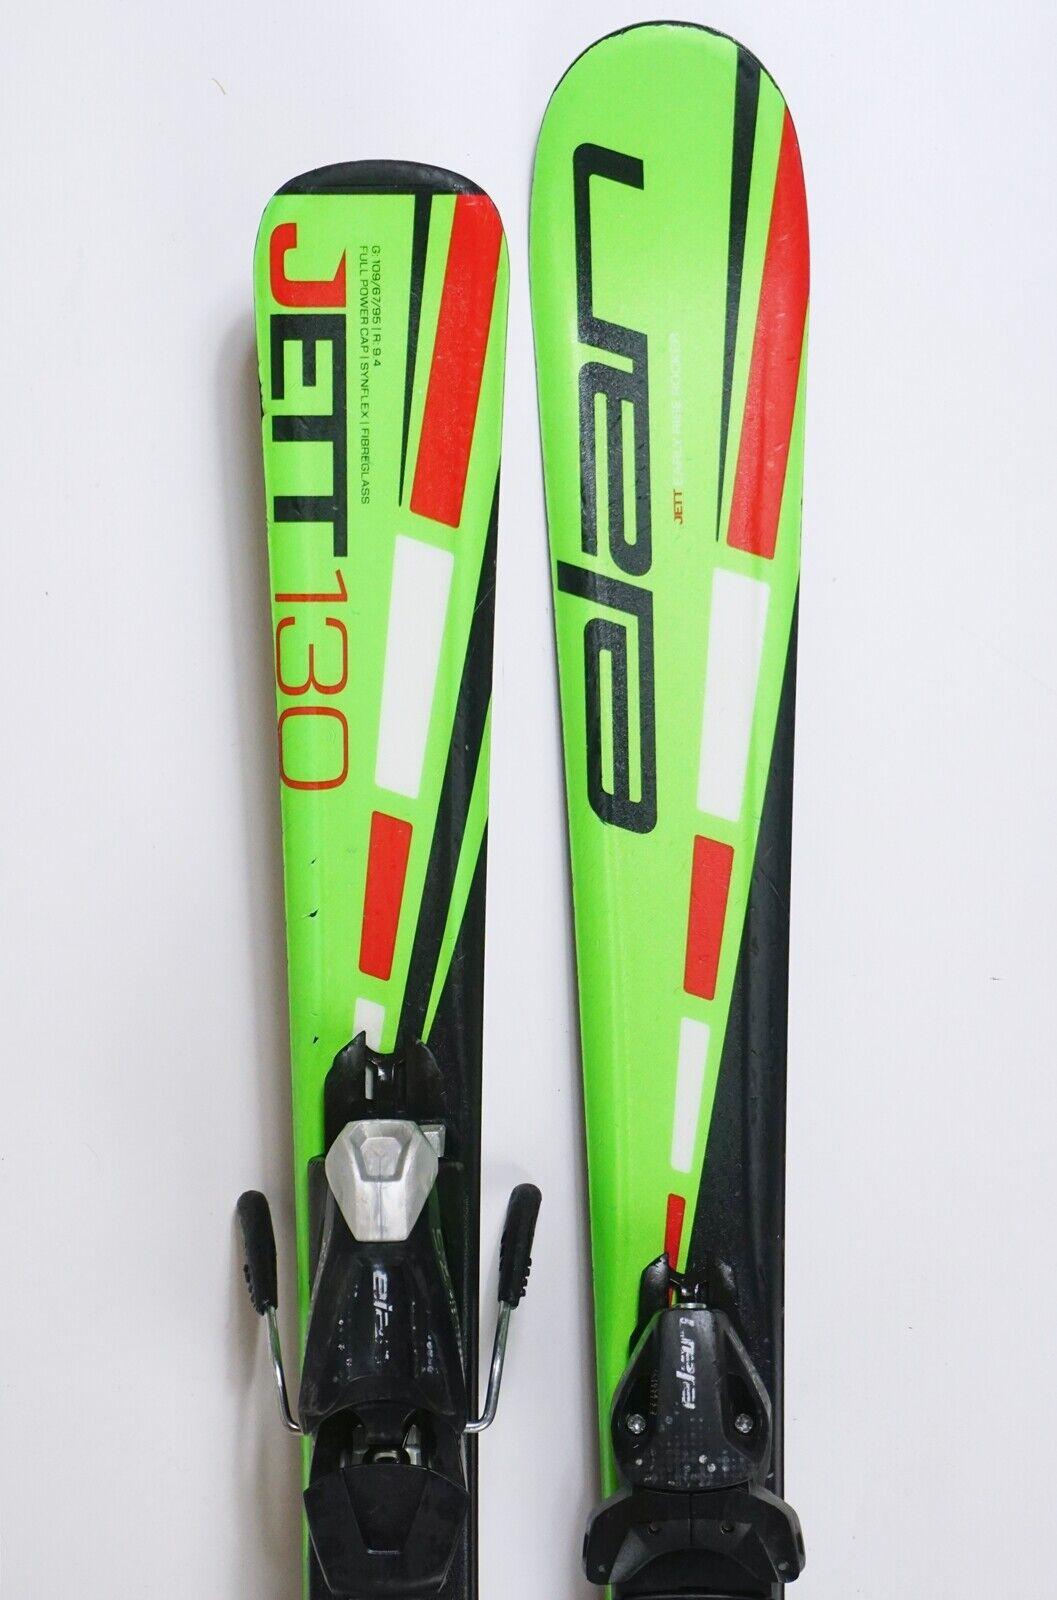 Ski Elan Jett Jugend Kinder Carvingski 130cm + EL 7.5 Bindung  (TB359)